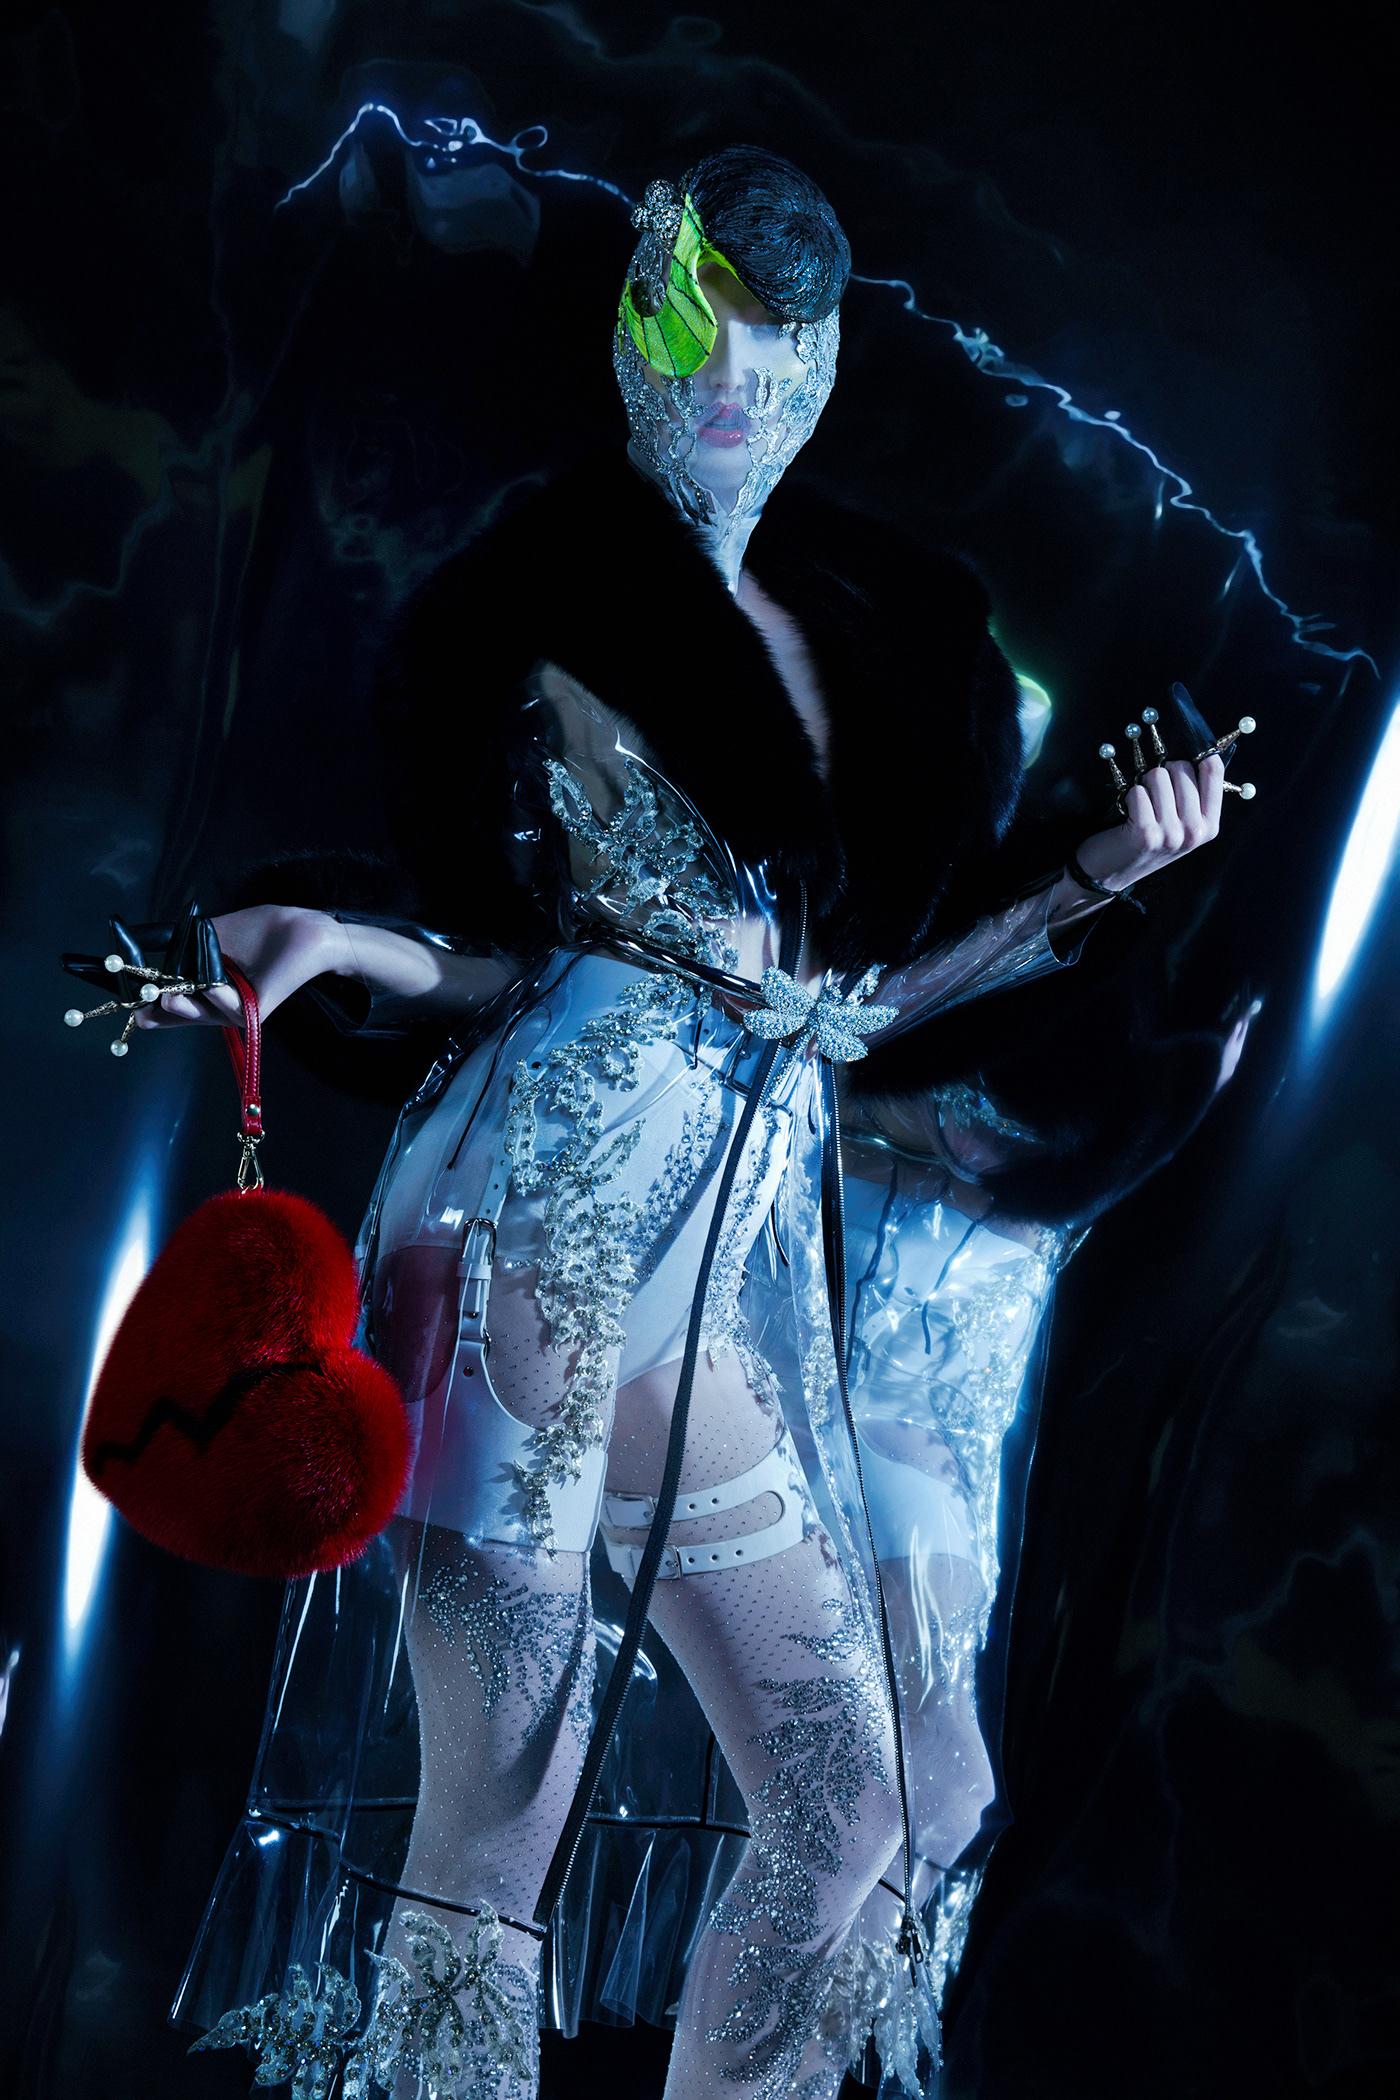 alien paper magazine avantgarde blind Alien Face bold latex Fashion  Space